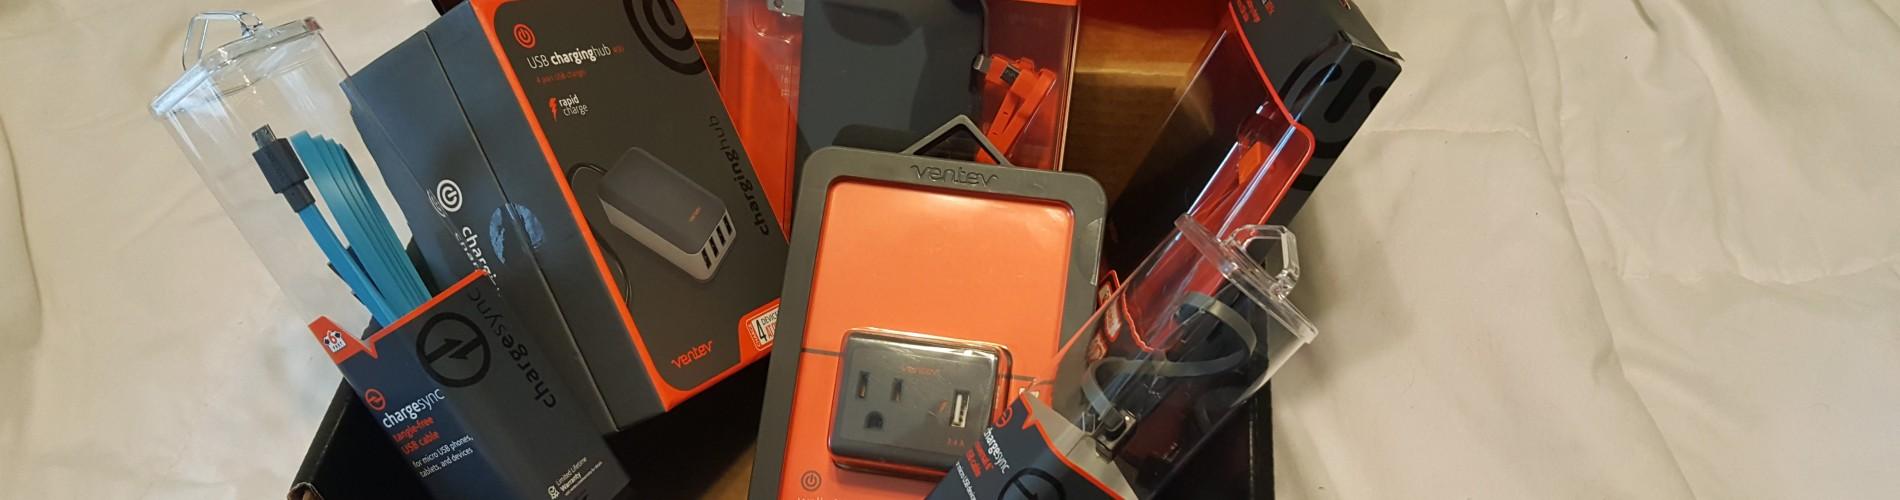 QUICK LOOK: Ventev portable power solutions